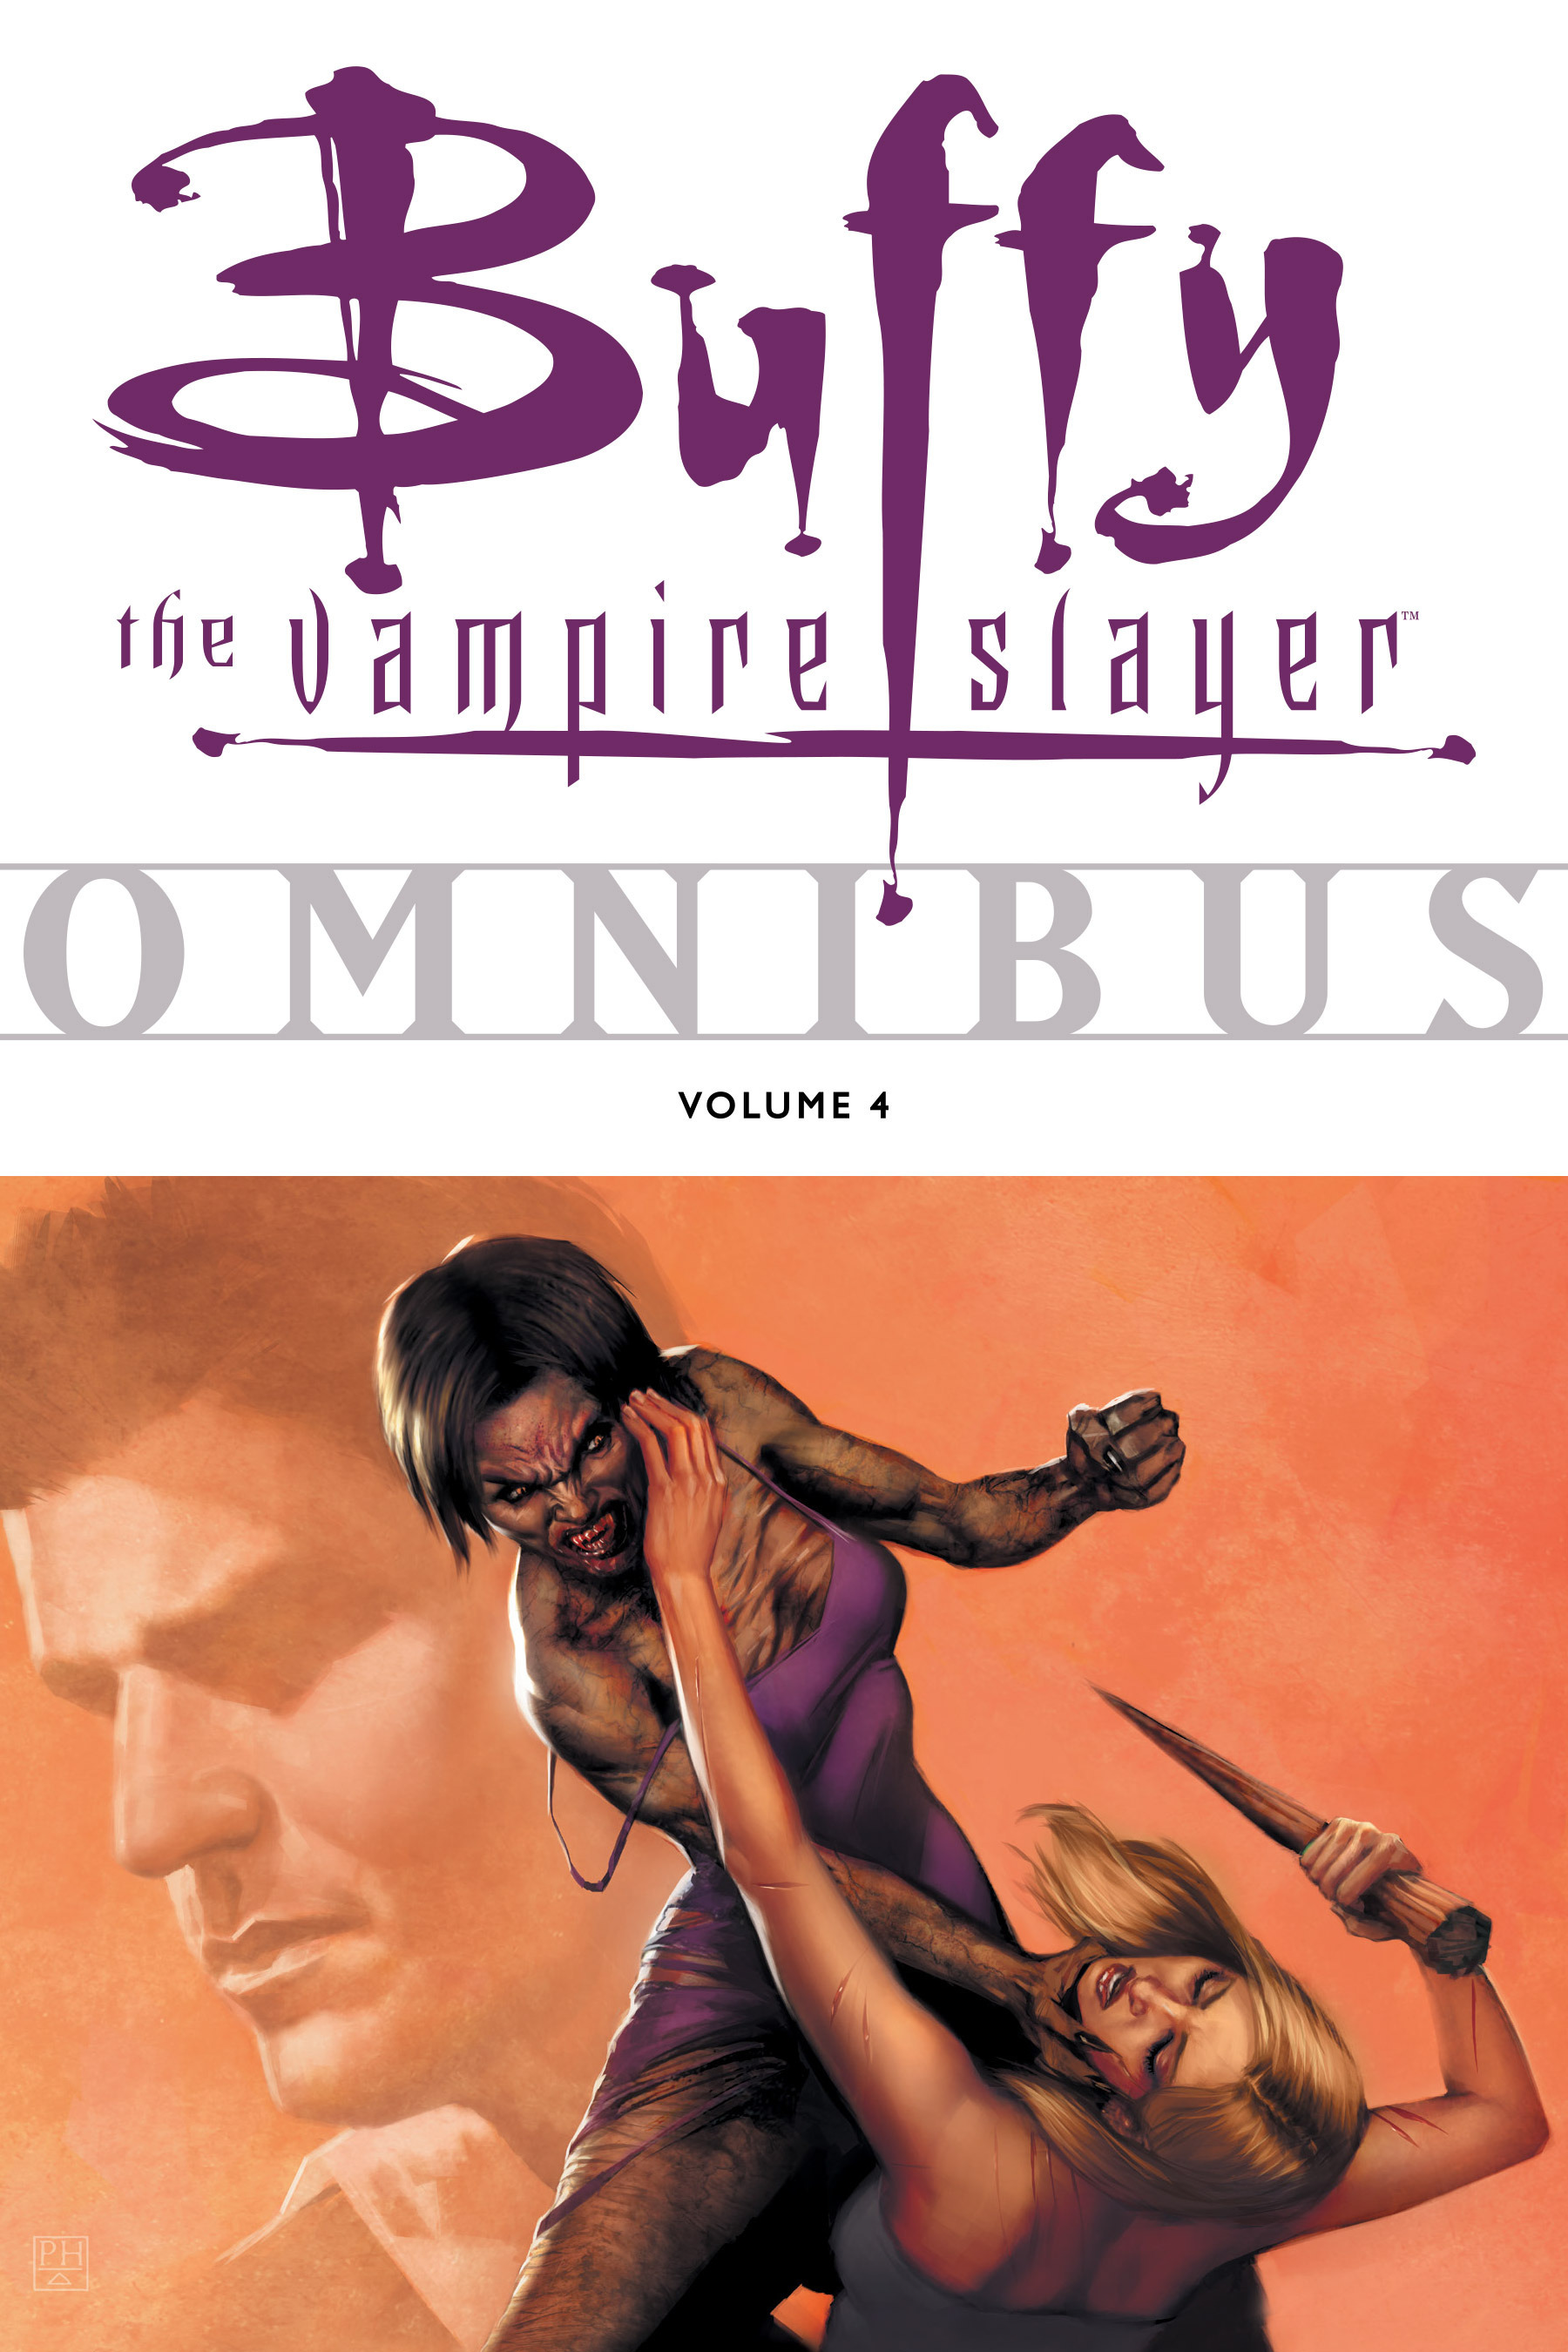 Read online Buffy the Vampire Slayer: Omnibus comic -  Issue # TPB 4 - 1